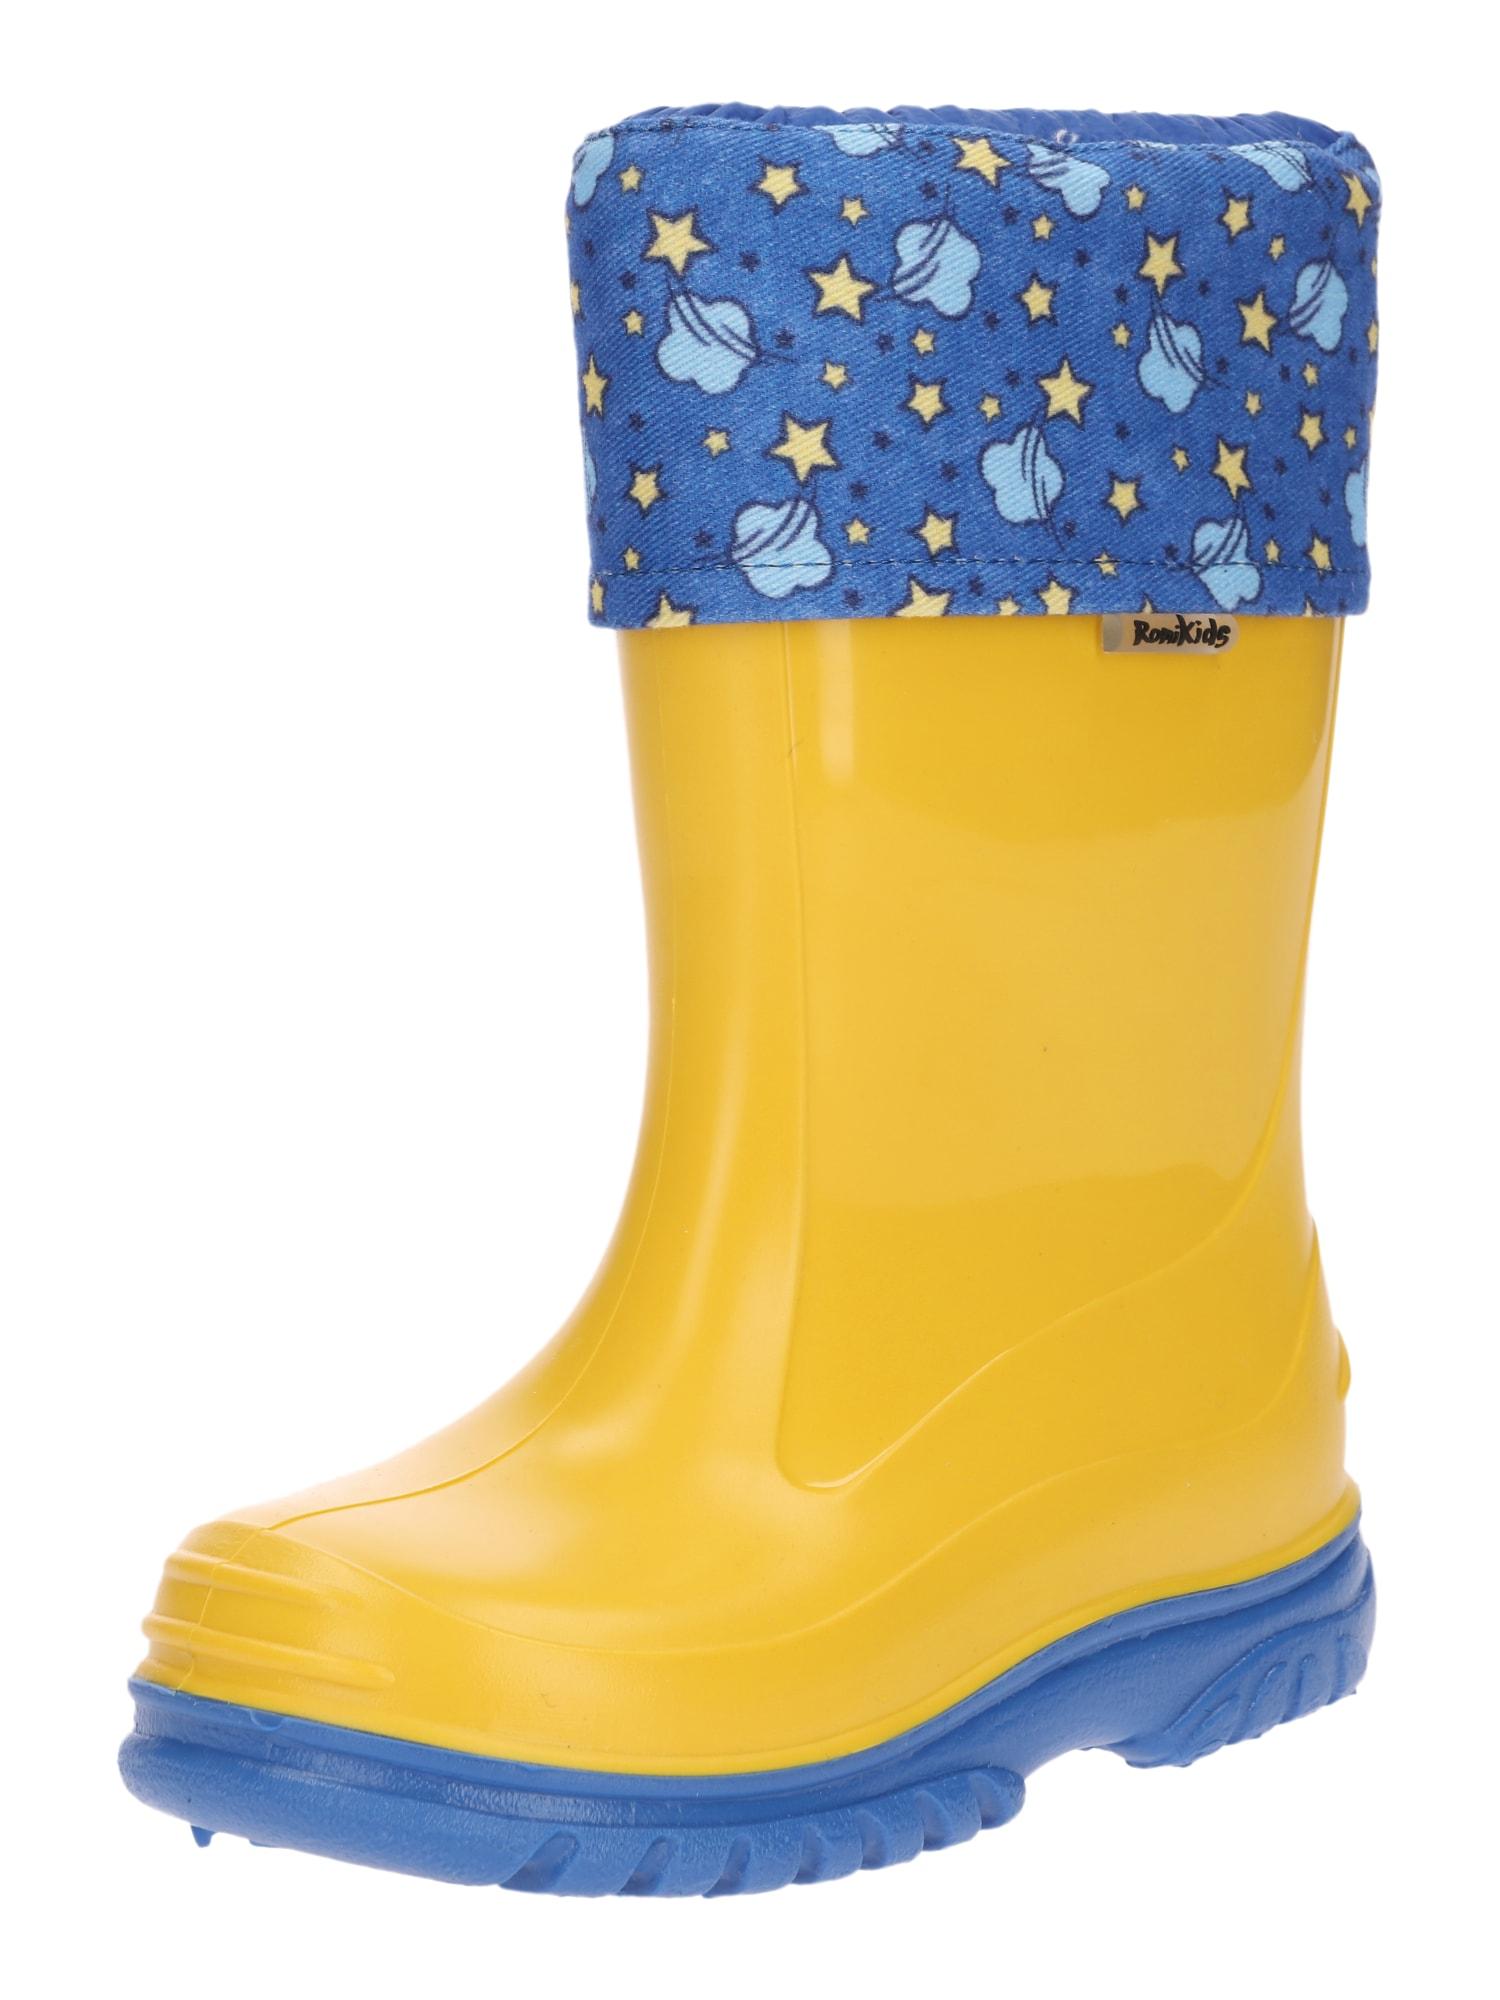 Gumové holínky Color Star nebeská modř žlutá ROMIKA